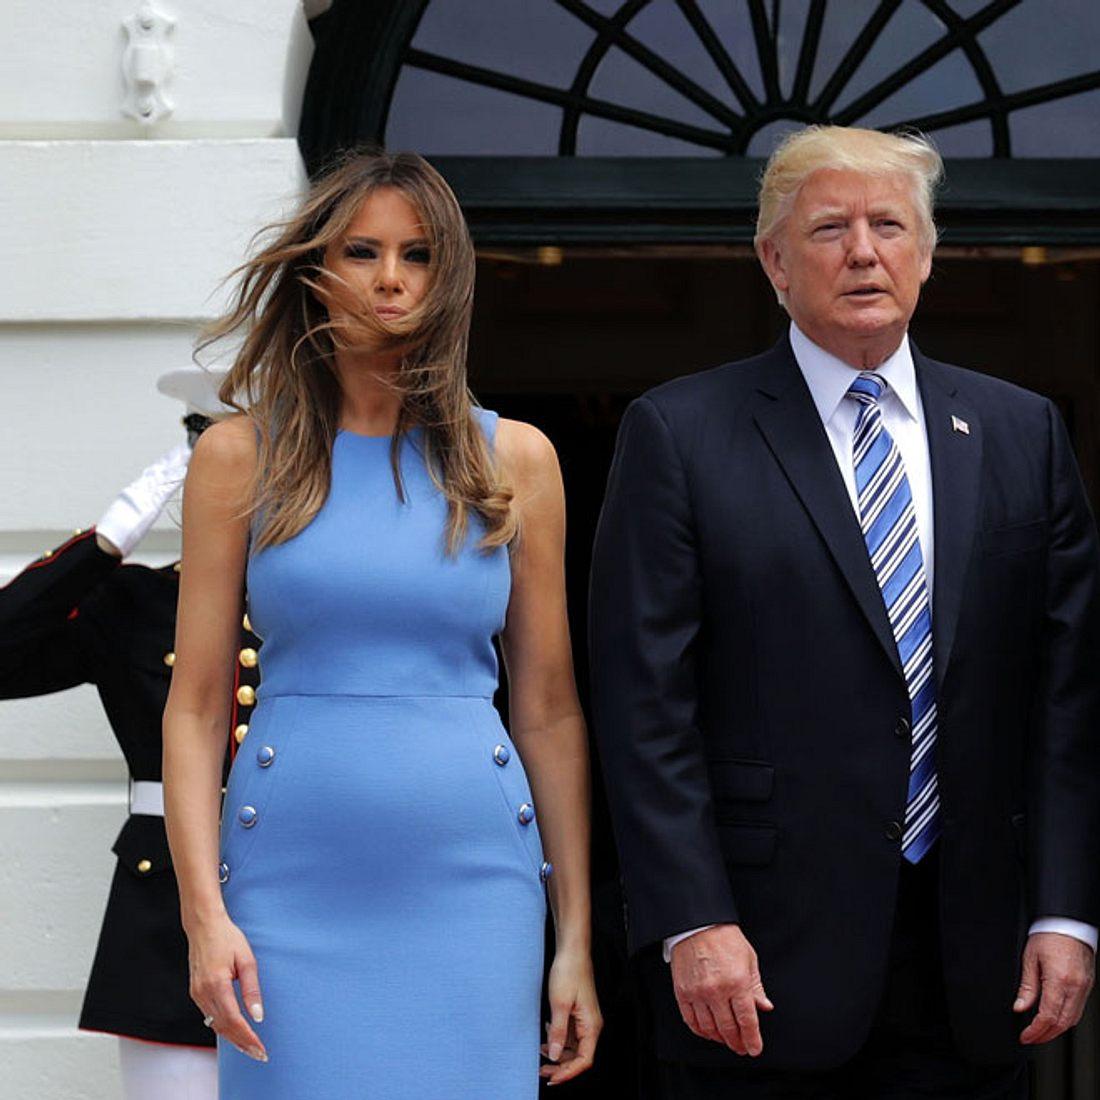 Erwarten Melania und Donald Trump etwa Nachwuchs?